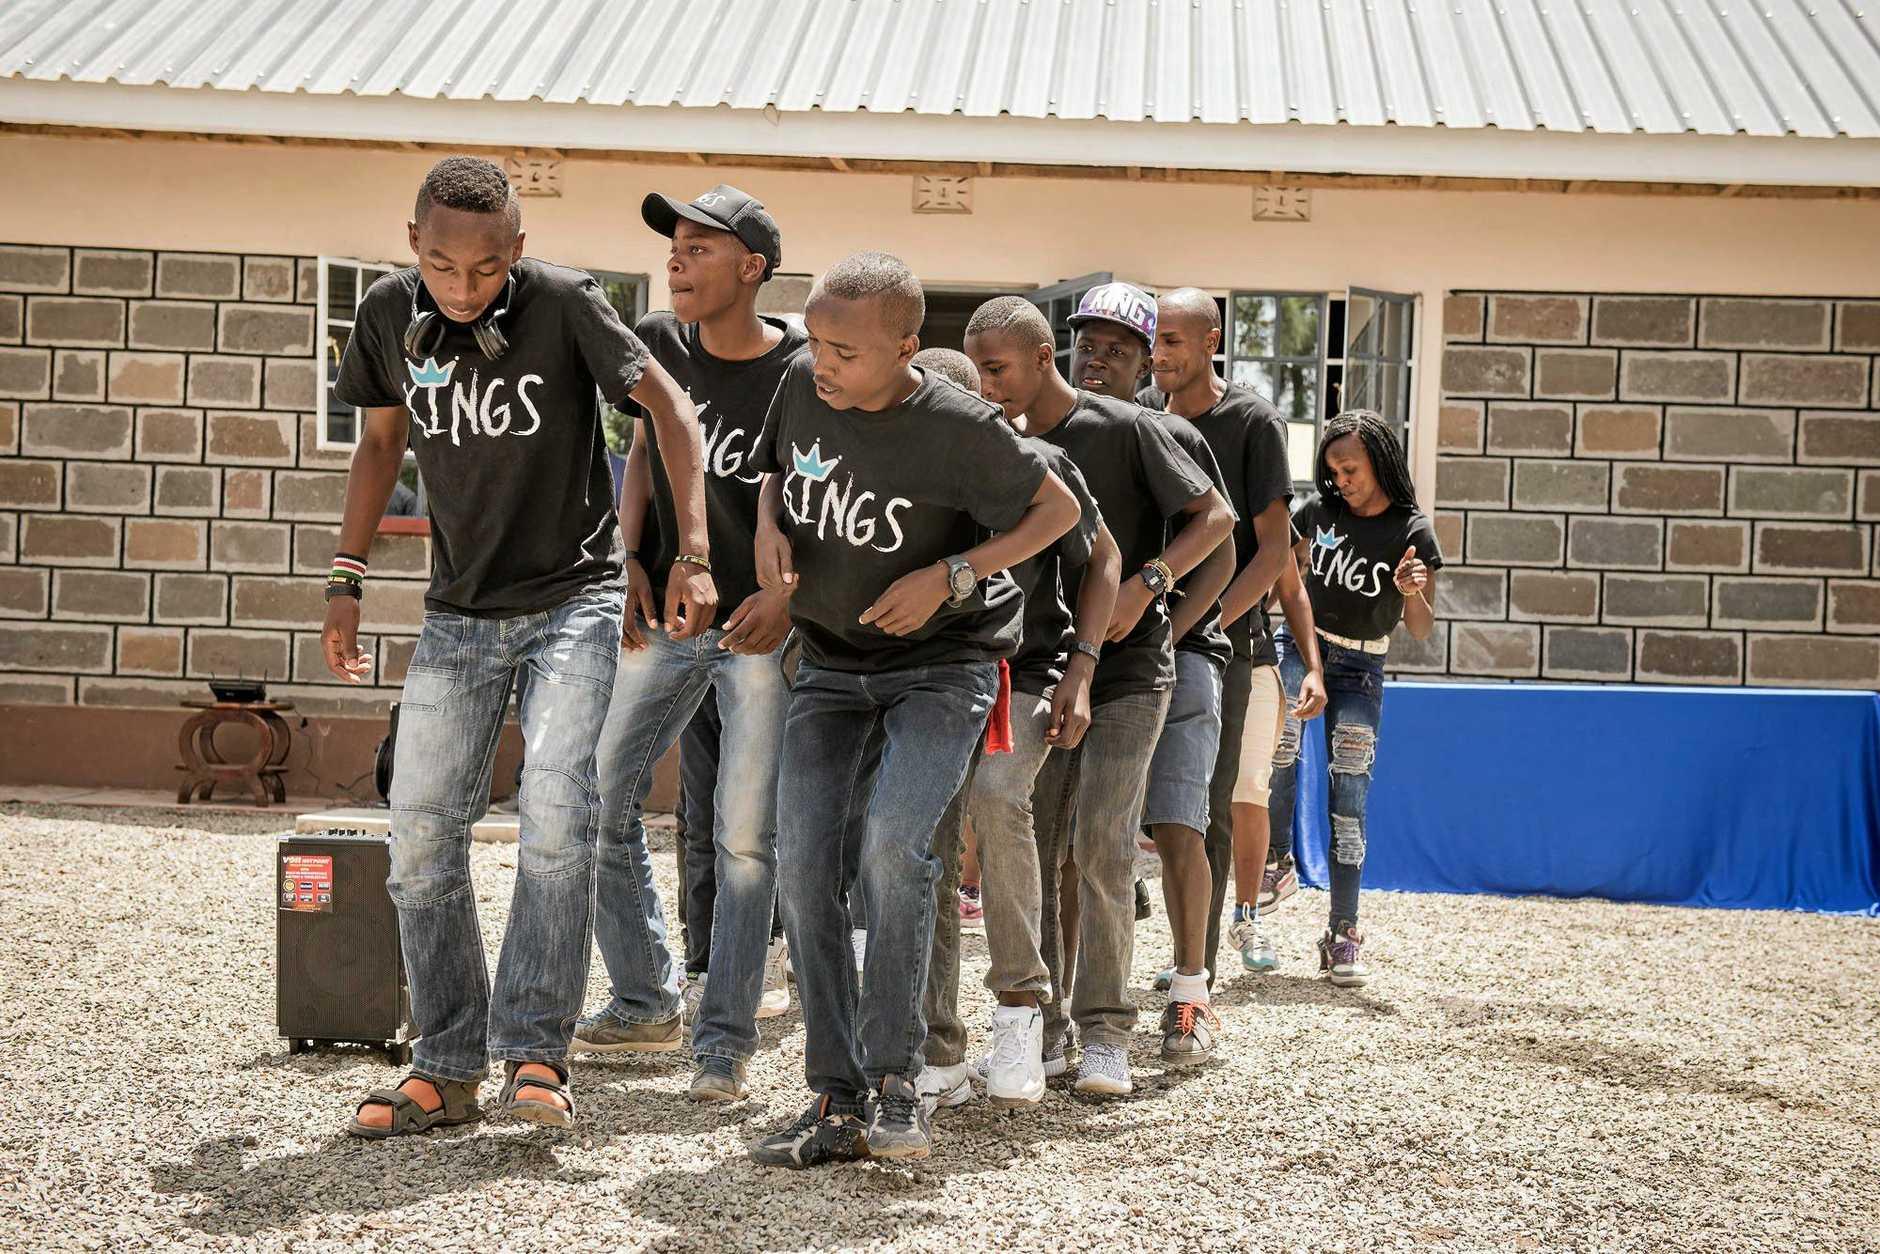 The Rafiki Mwema charity operates in Kenya. Photo Contributed